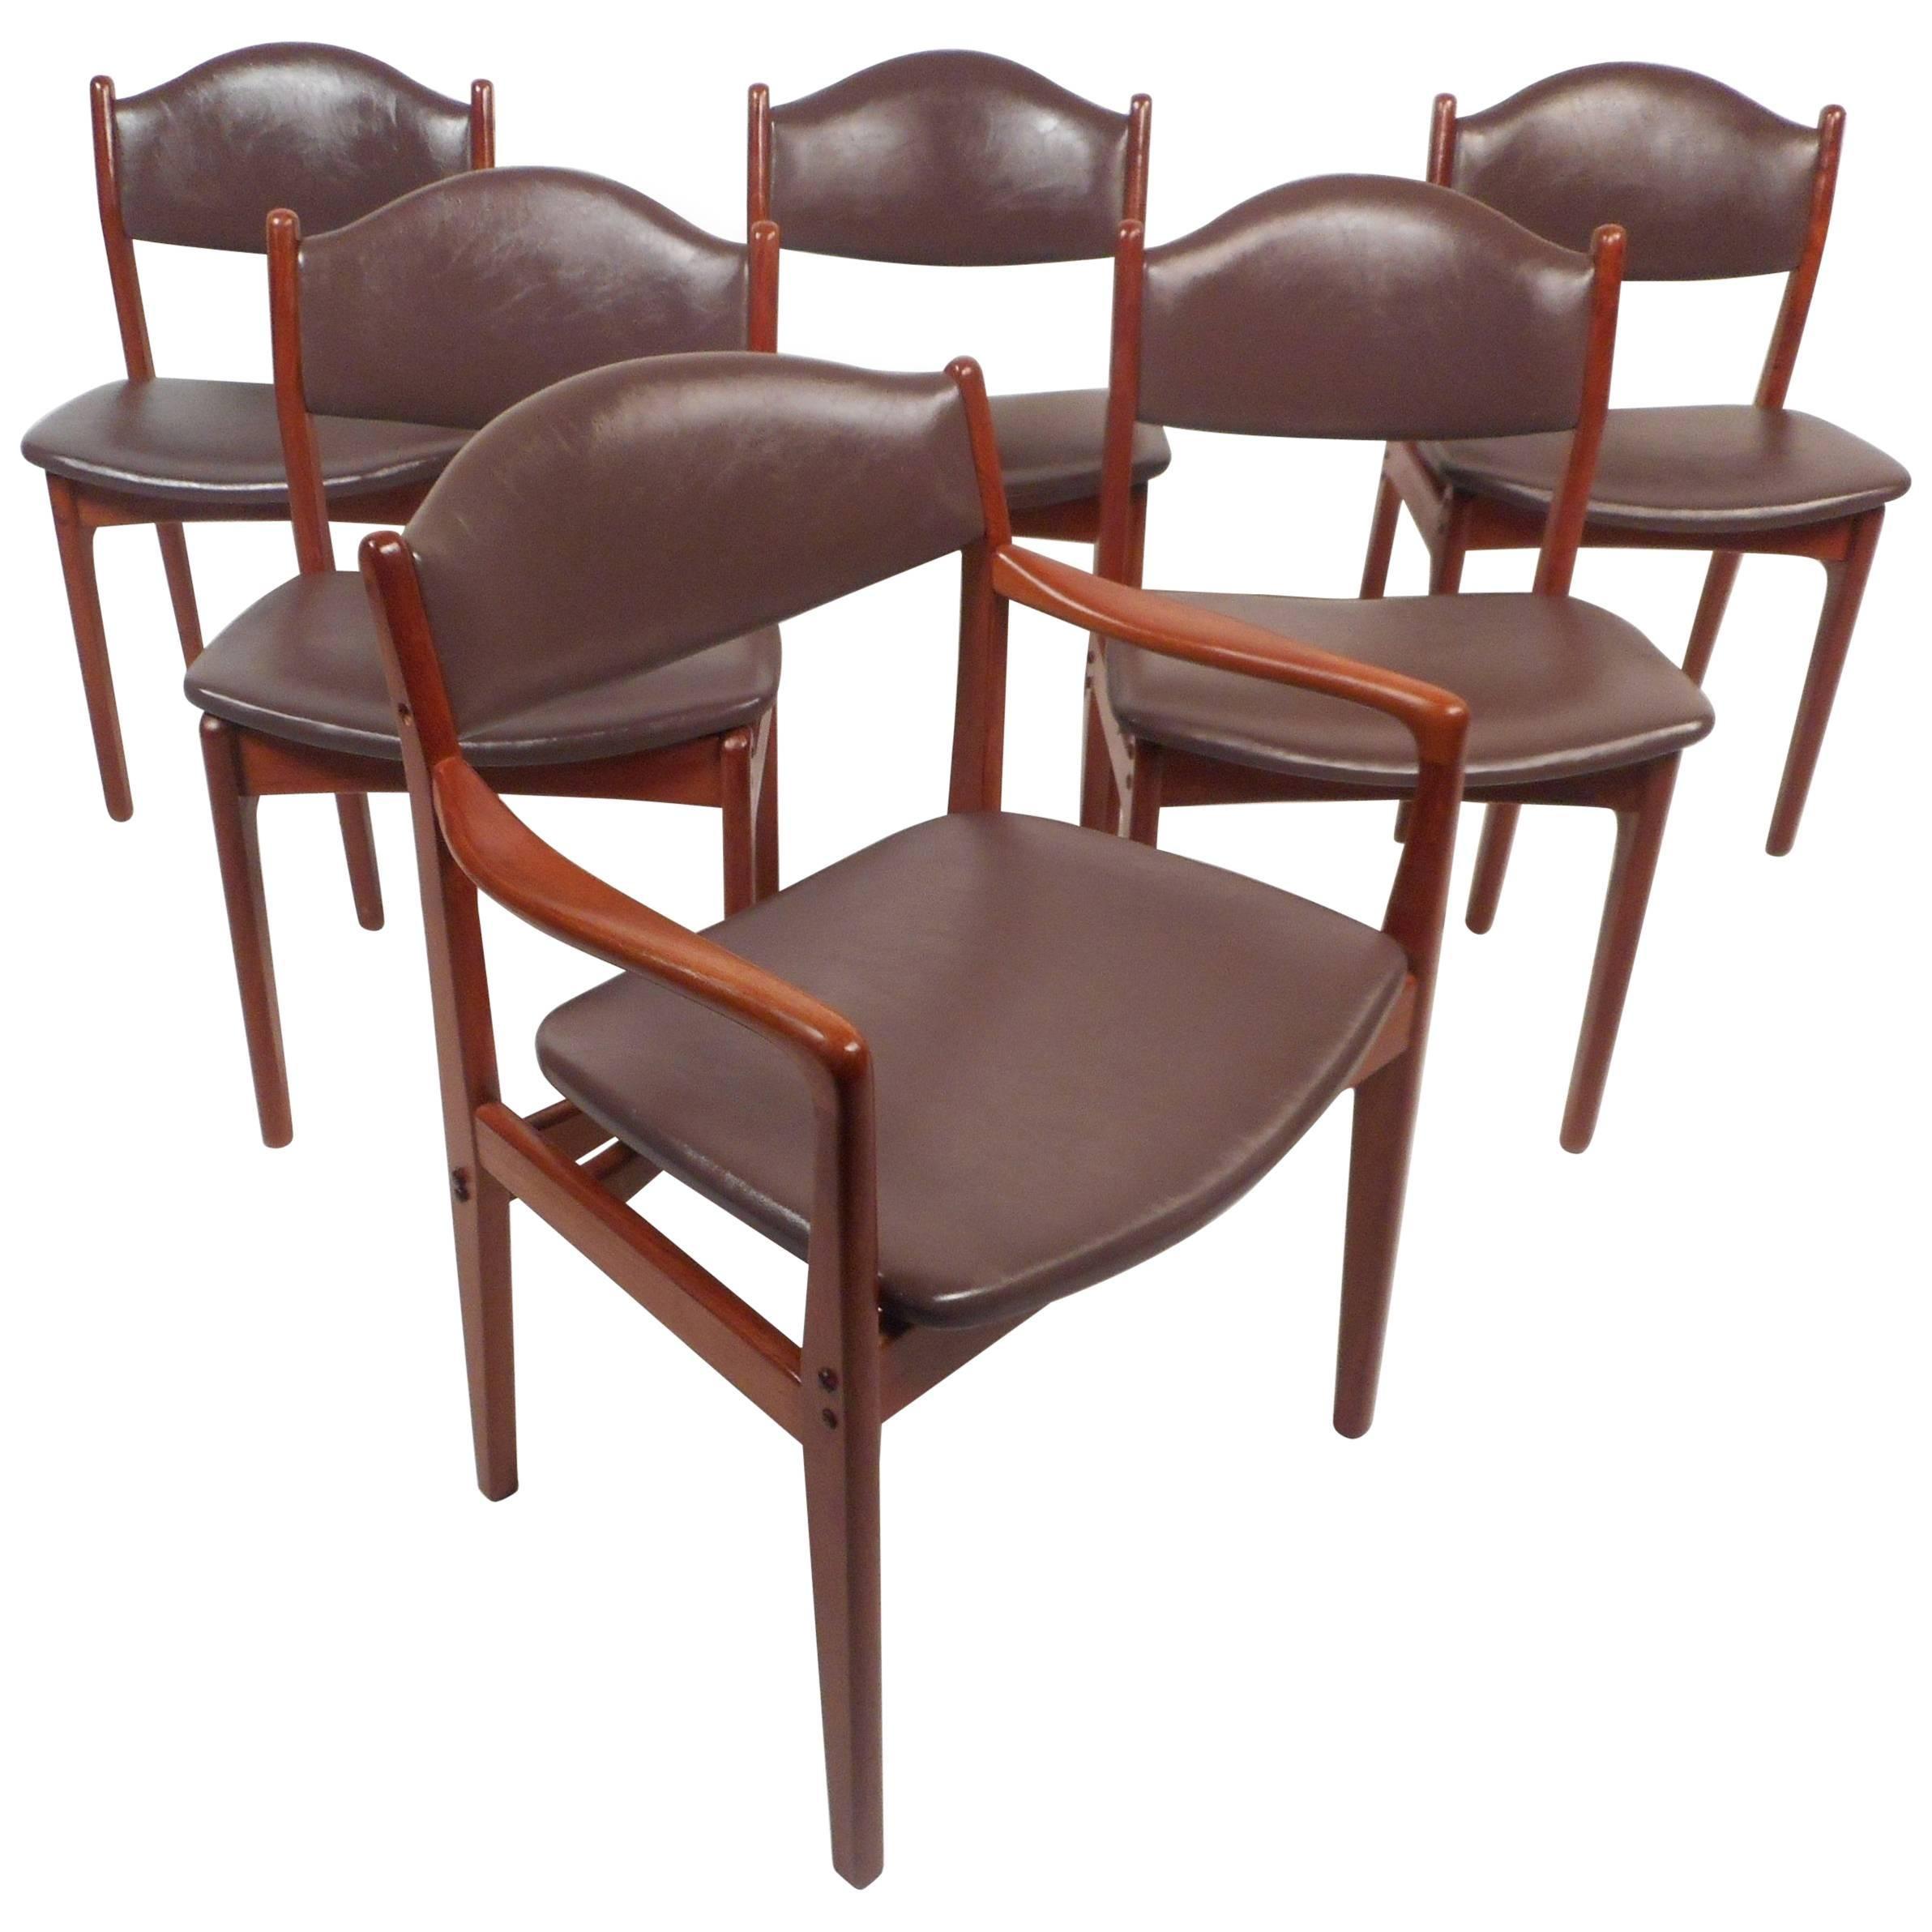 Set of Six Mid-Century Modern Danish Teak Dining Chairs